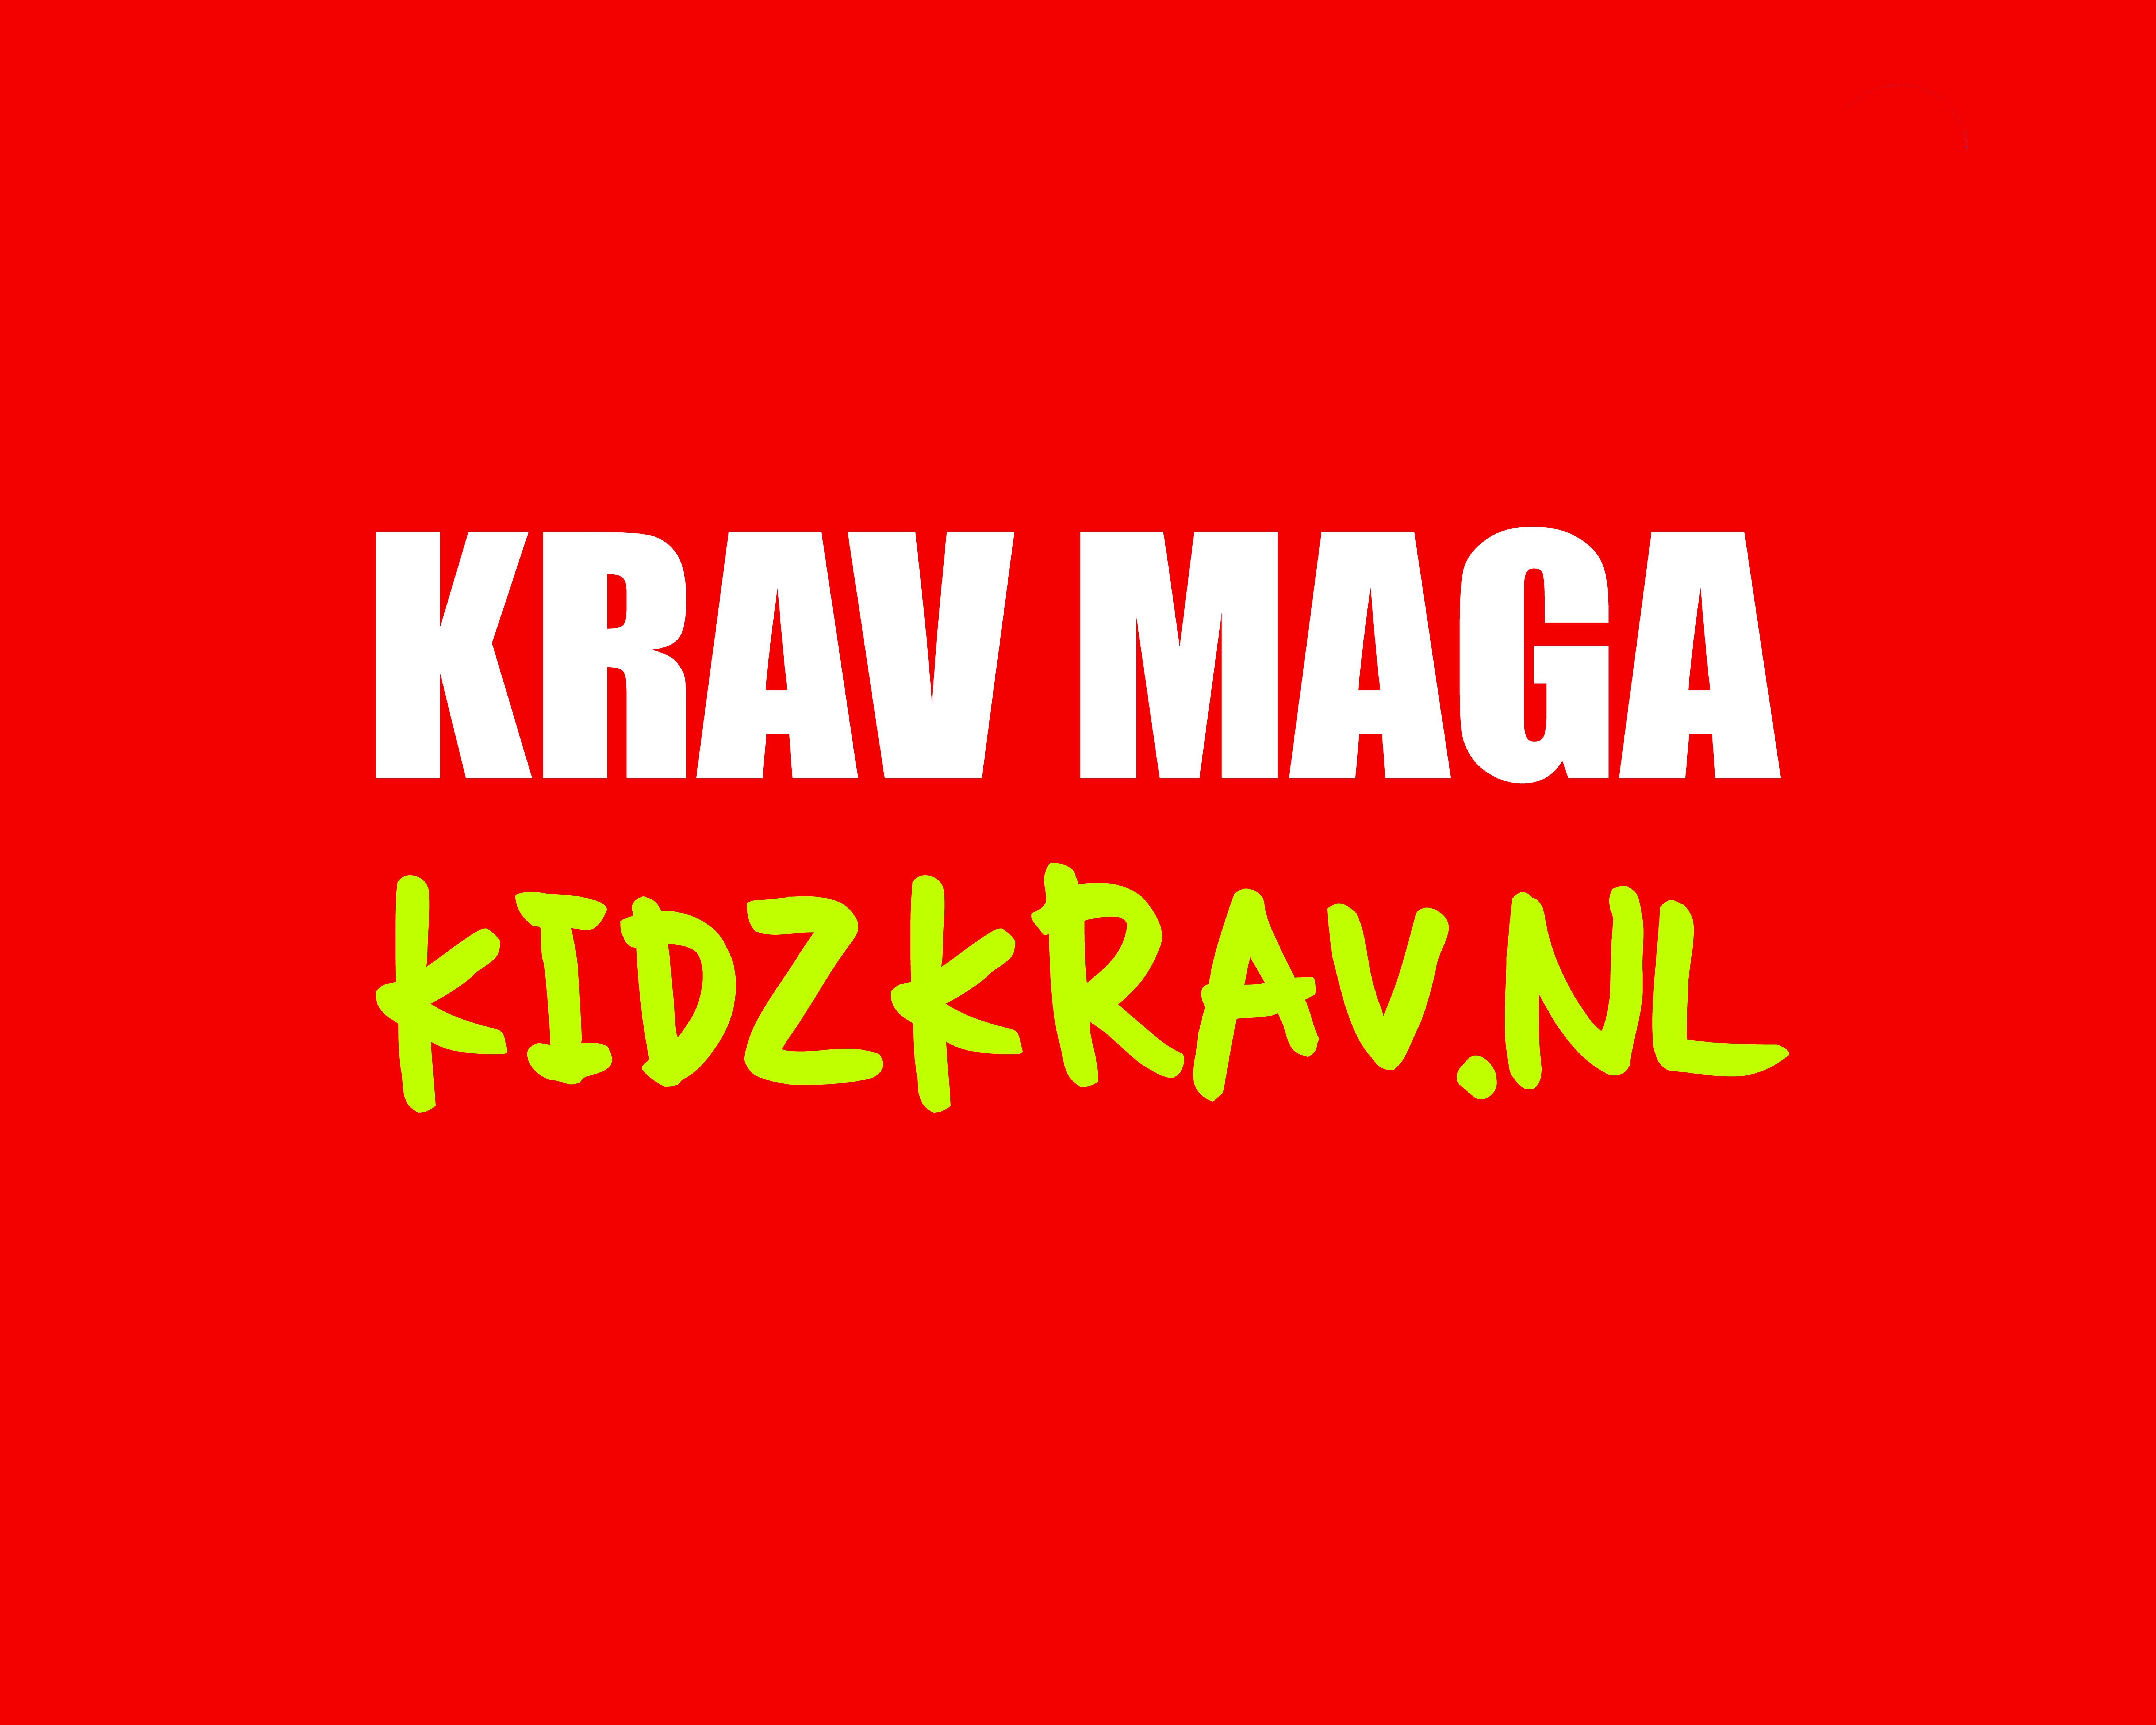 Kidz Krav T-shirt 7